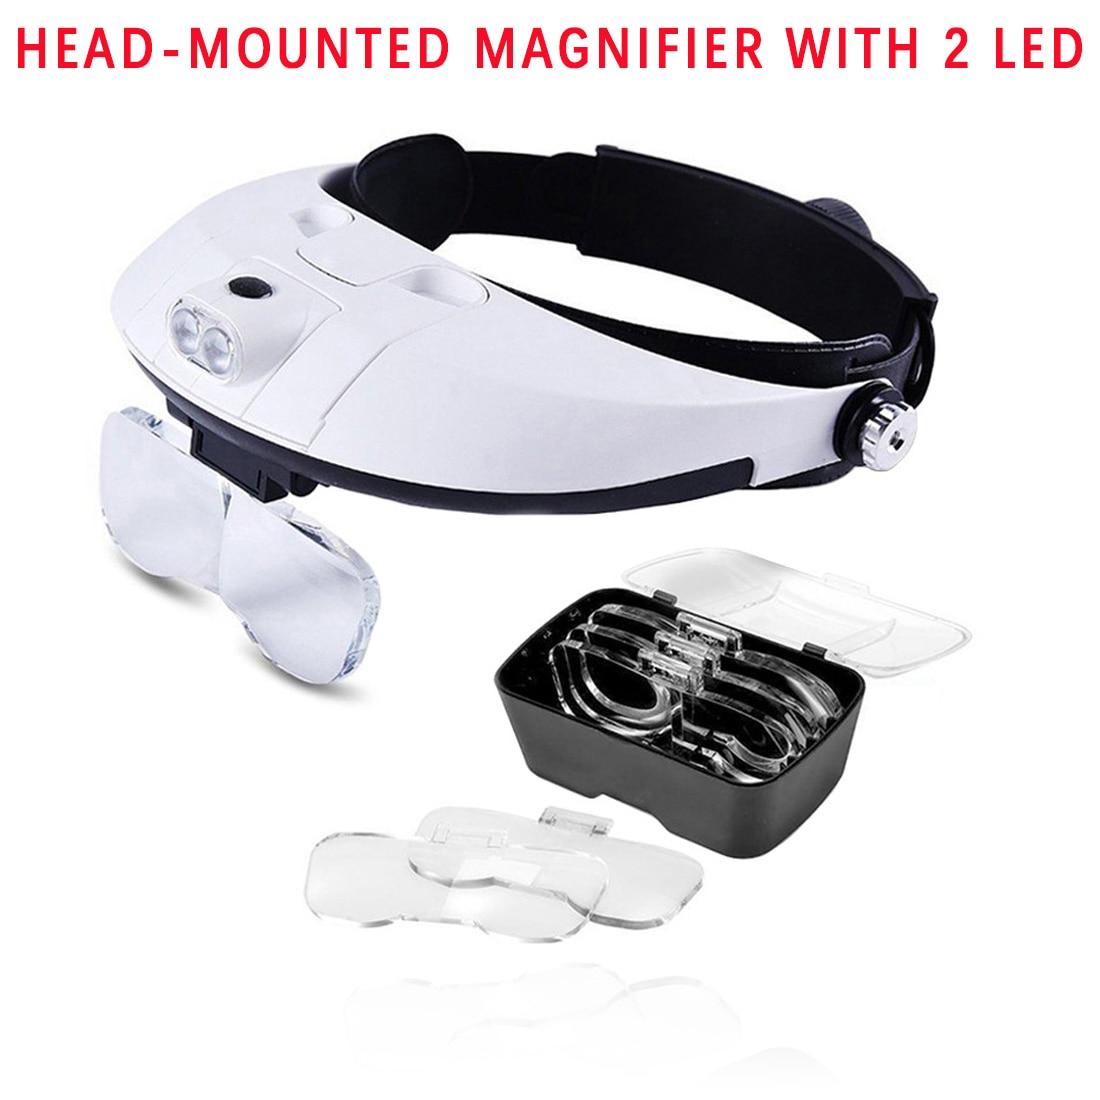 2 lupas LED para lupa, montura en la cabeza, lupa de bolsillo, microscopio, 5 lentes, 1,0x, 1,5x, 2,5x, 3,5x para herramientas de reparación